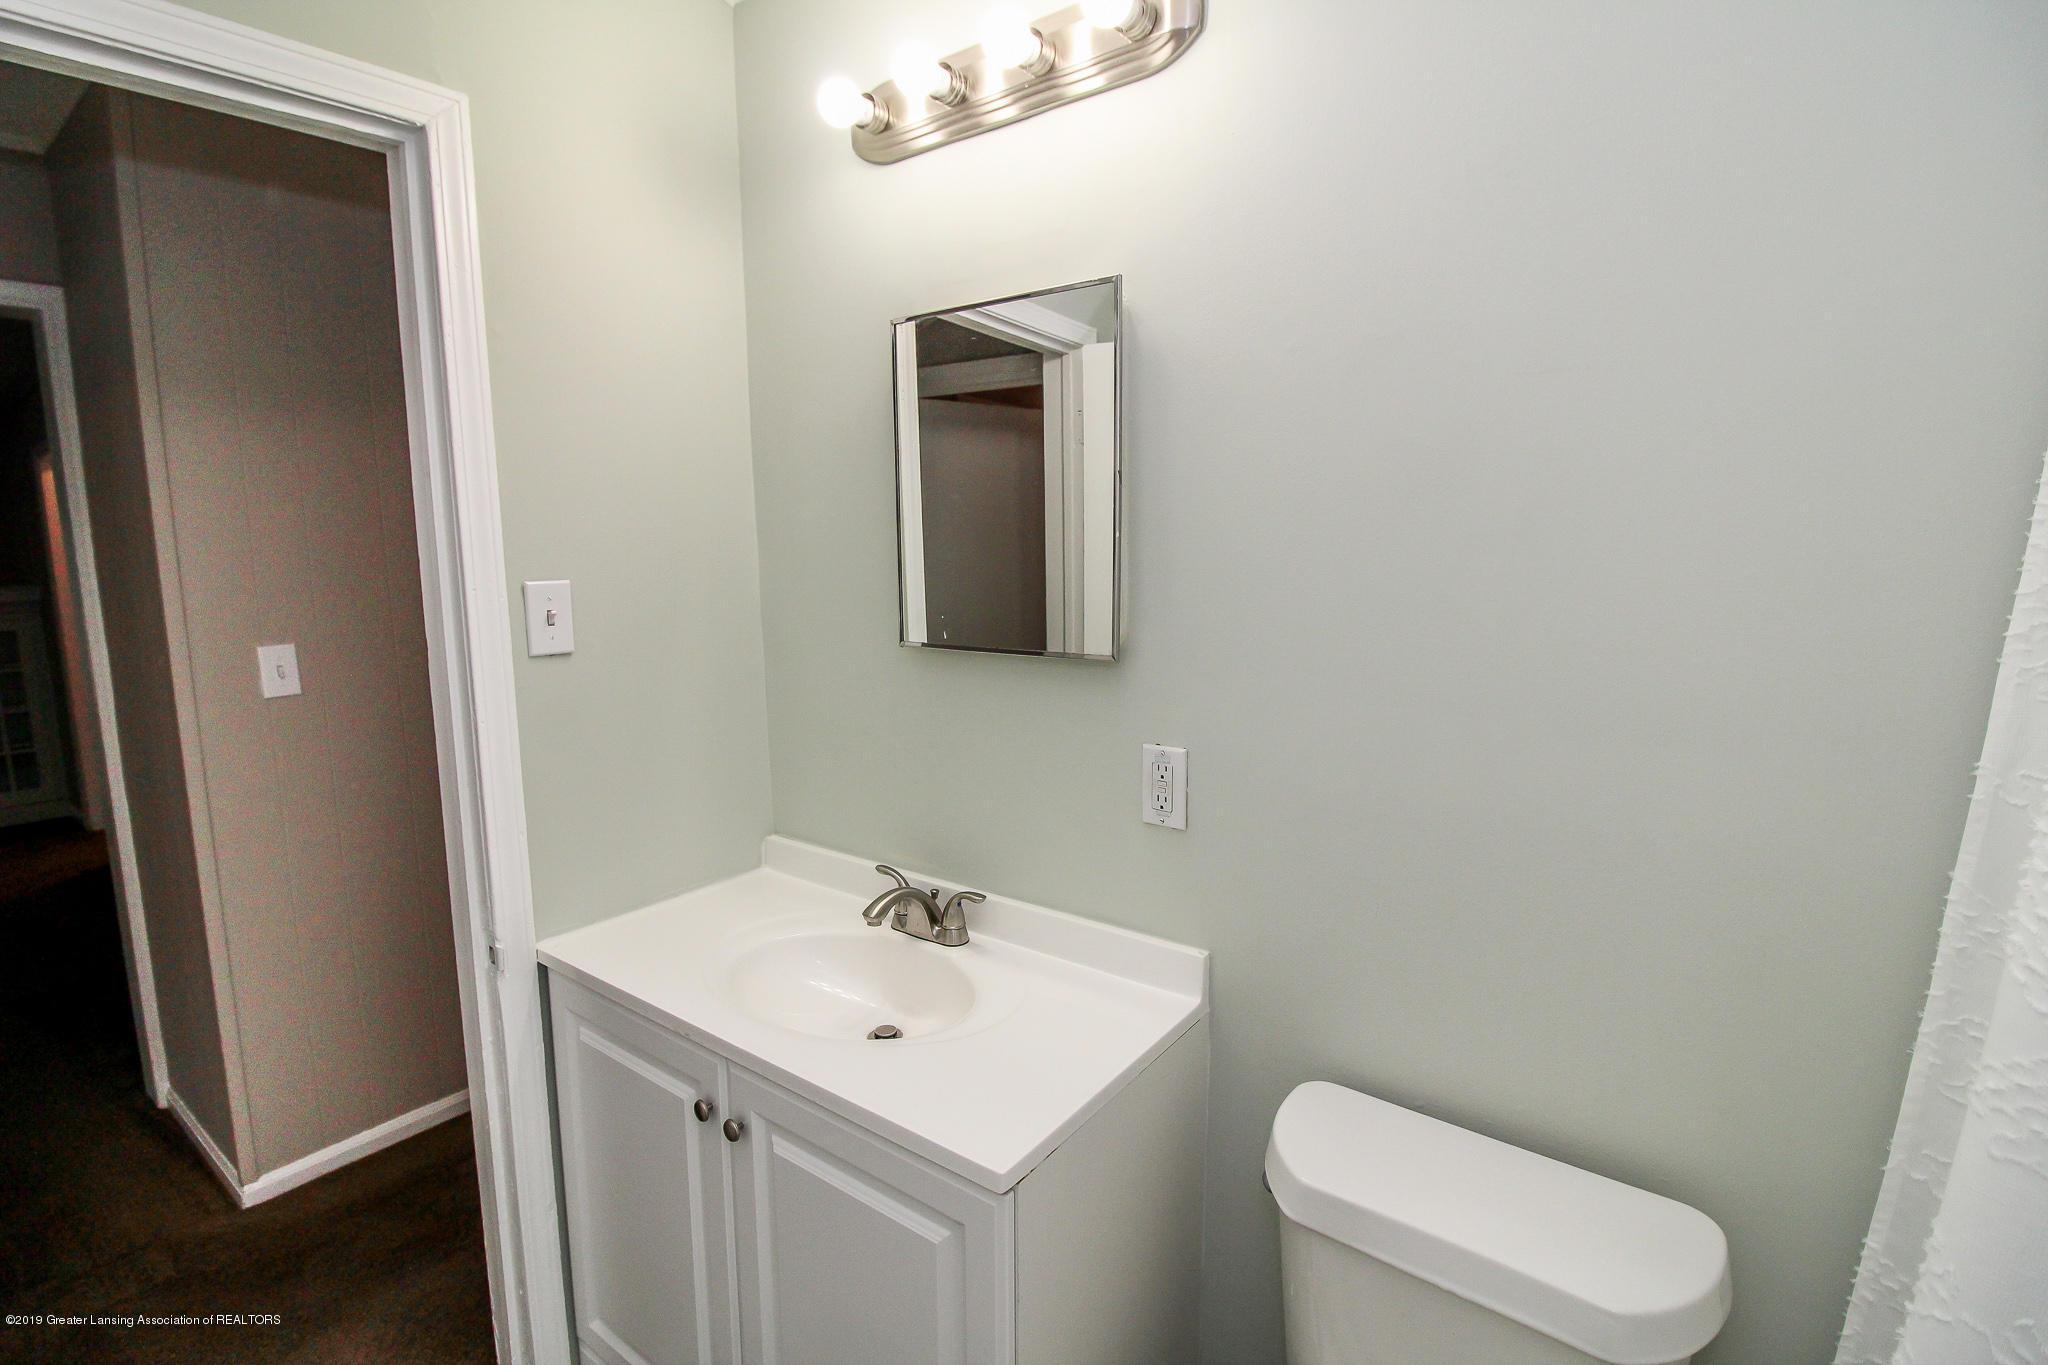 124 Northlawn Ave - 22 First Floor Bathroom 3 - 18